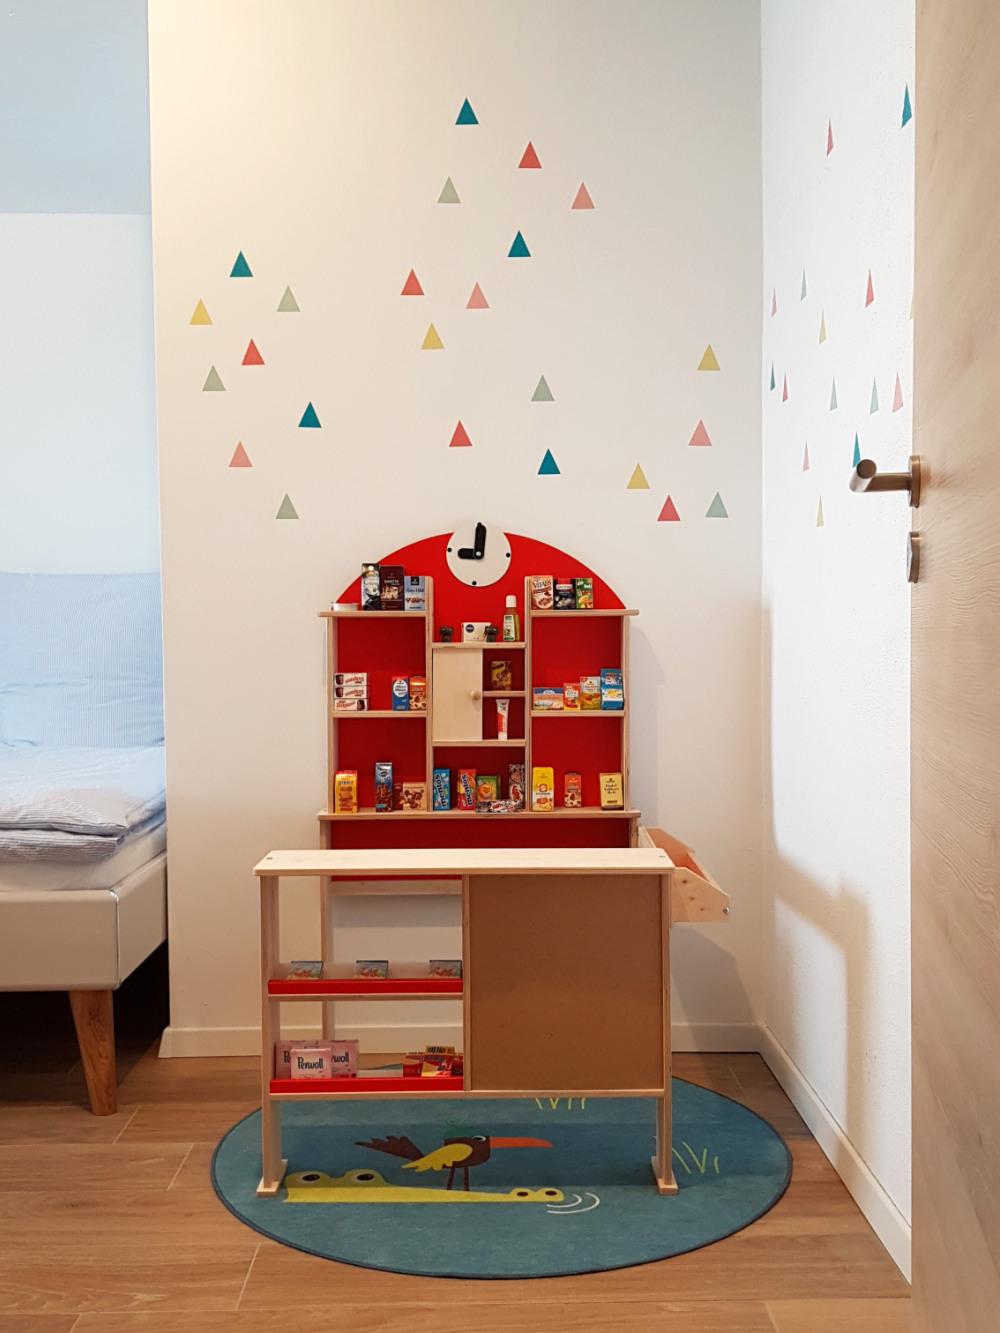 Full Size of Kinderzimmer Regal Regale Weiß Sofa Kinderzimmer Kinderzimmer Pferd